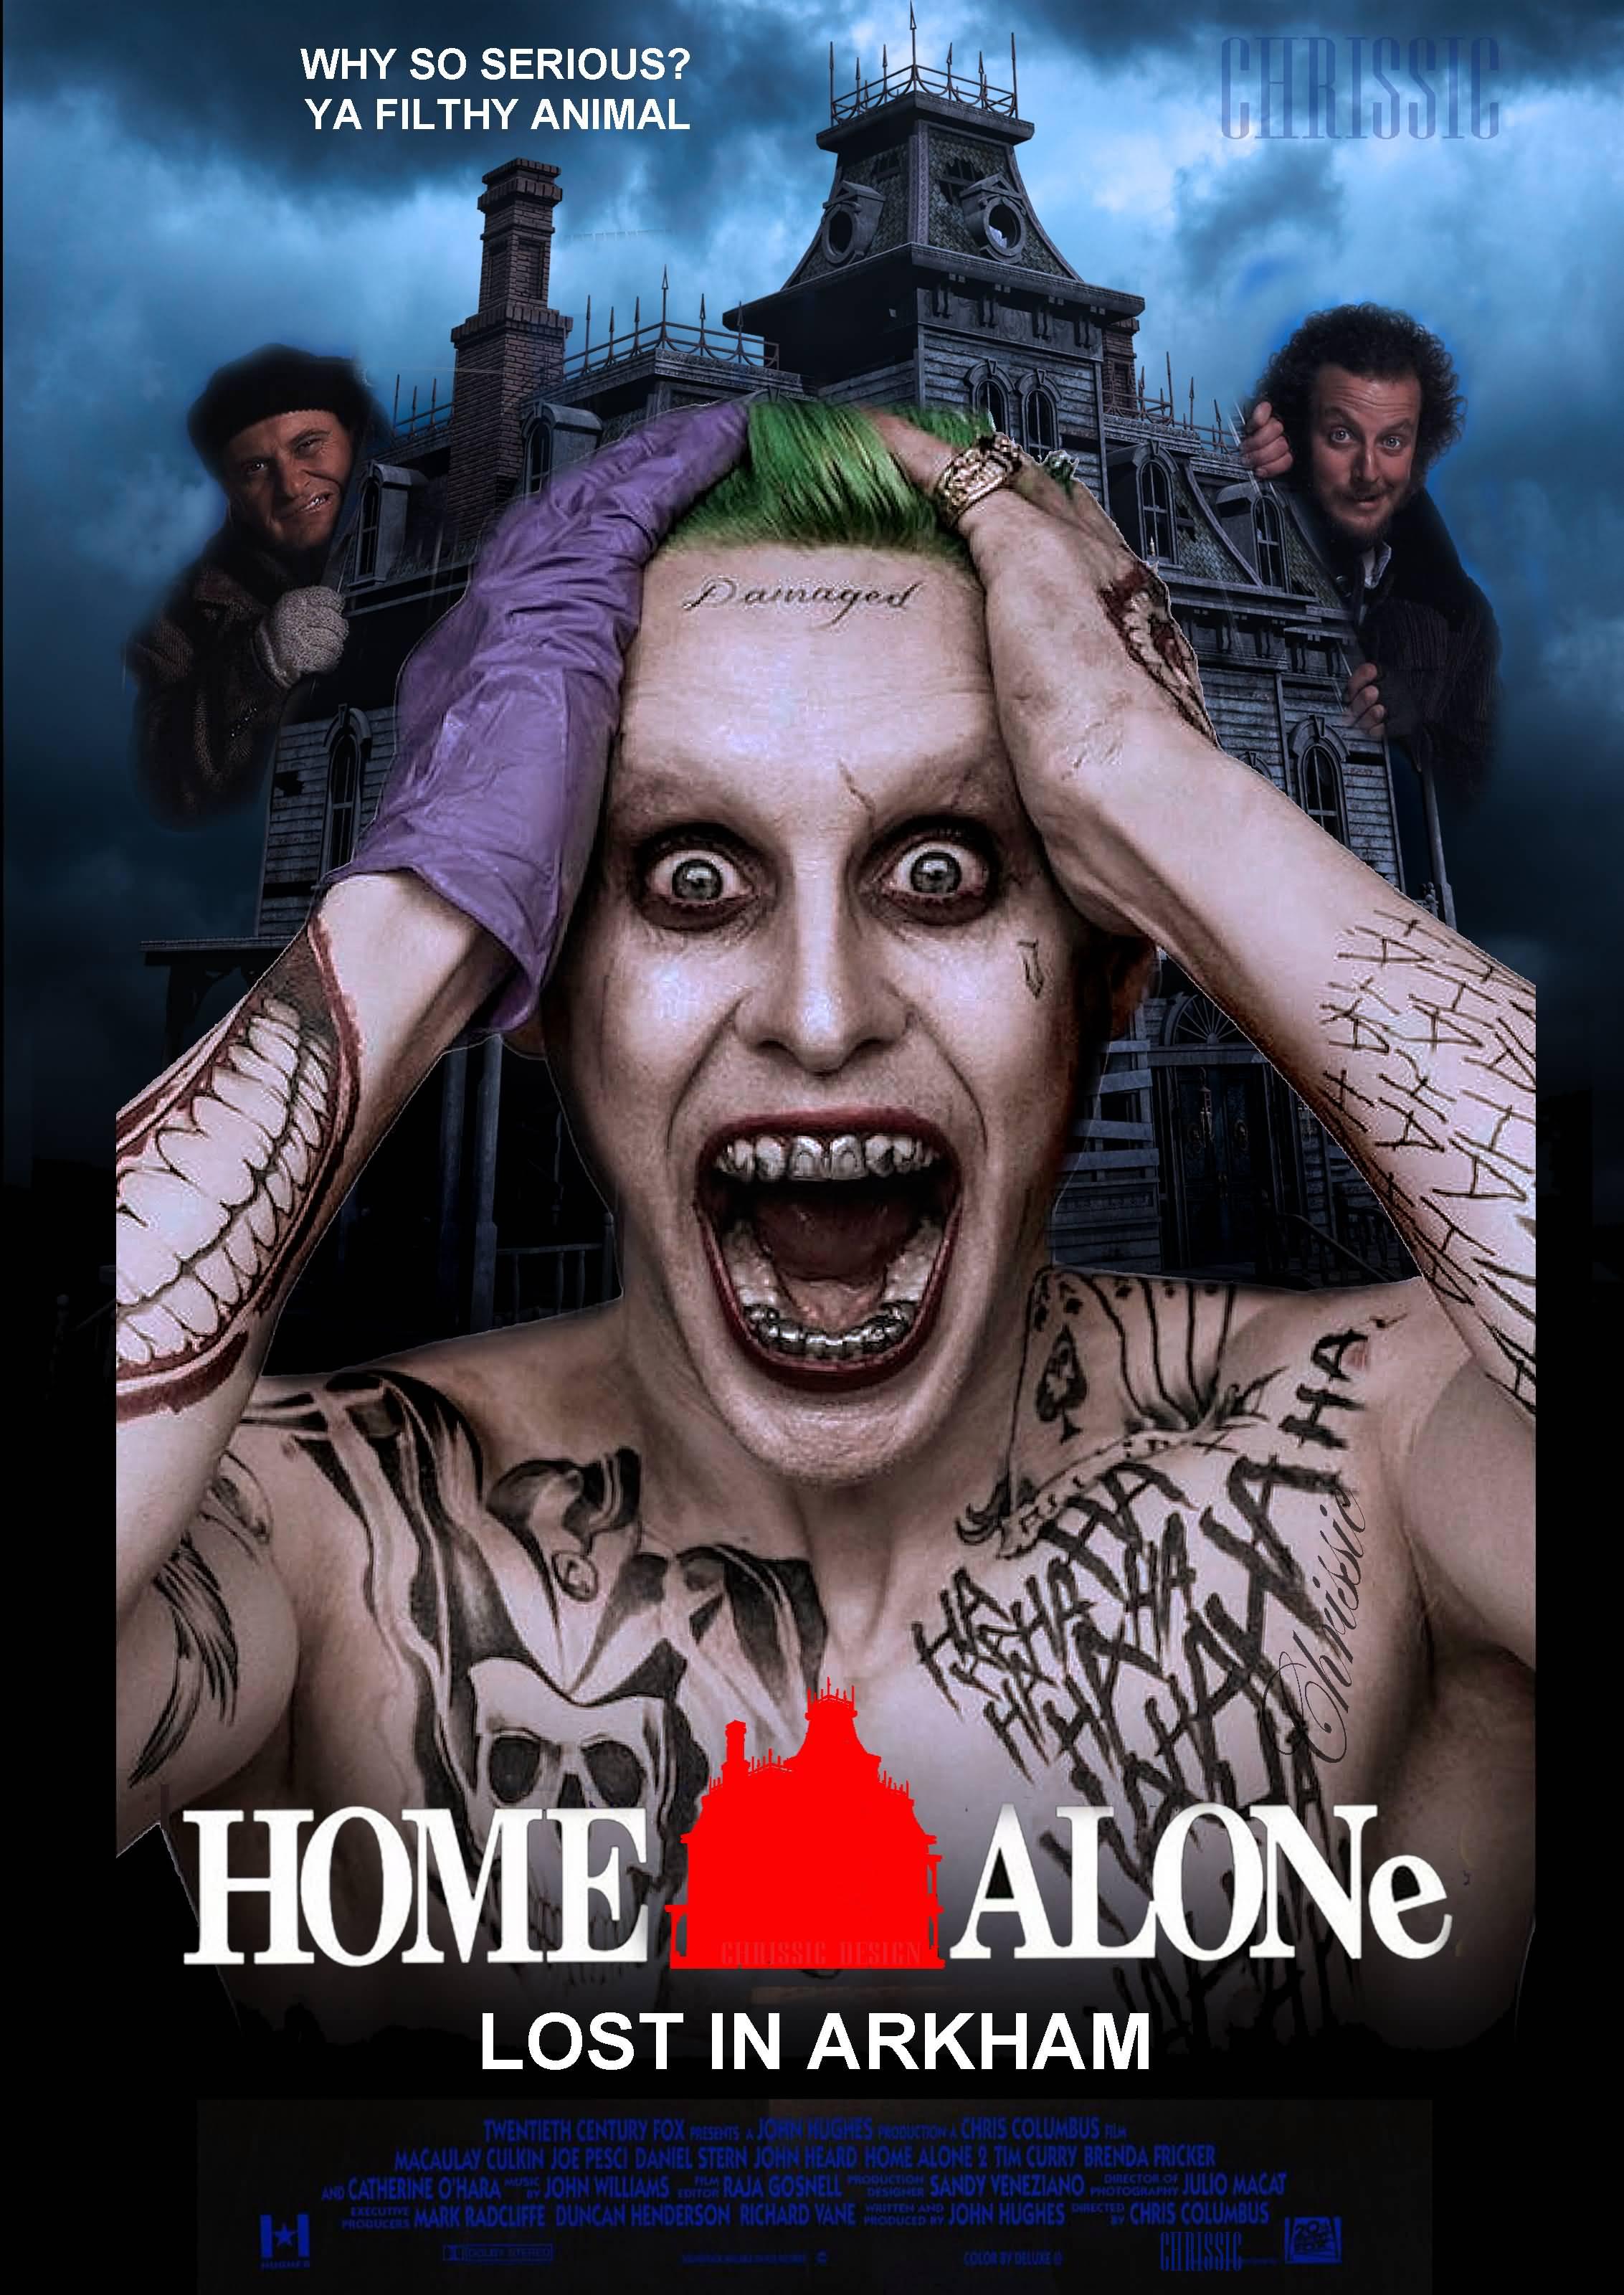 Jared Leto Joker Meme Funny Image Photo Joke 07